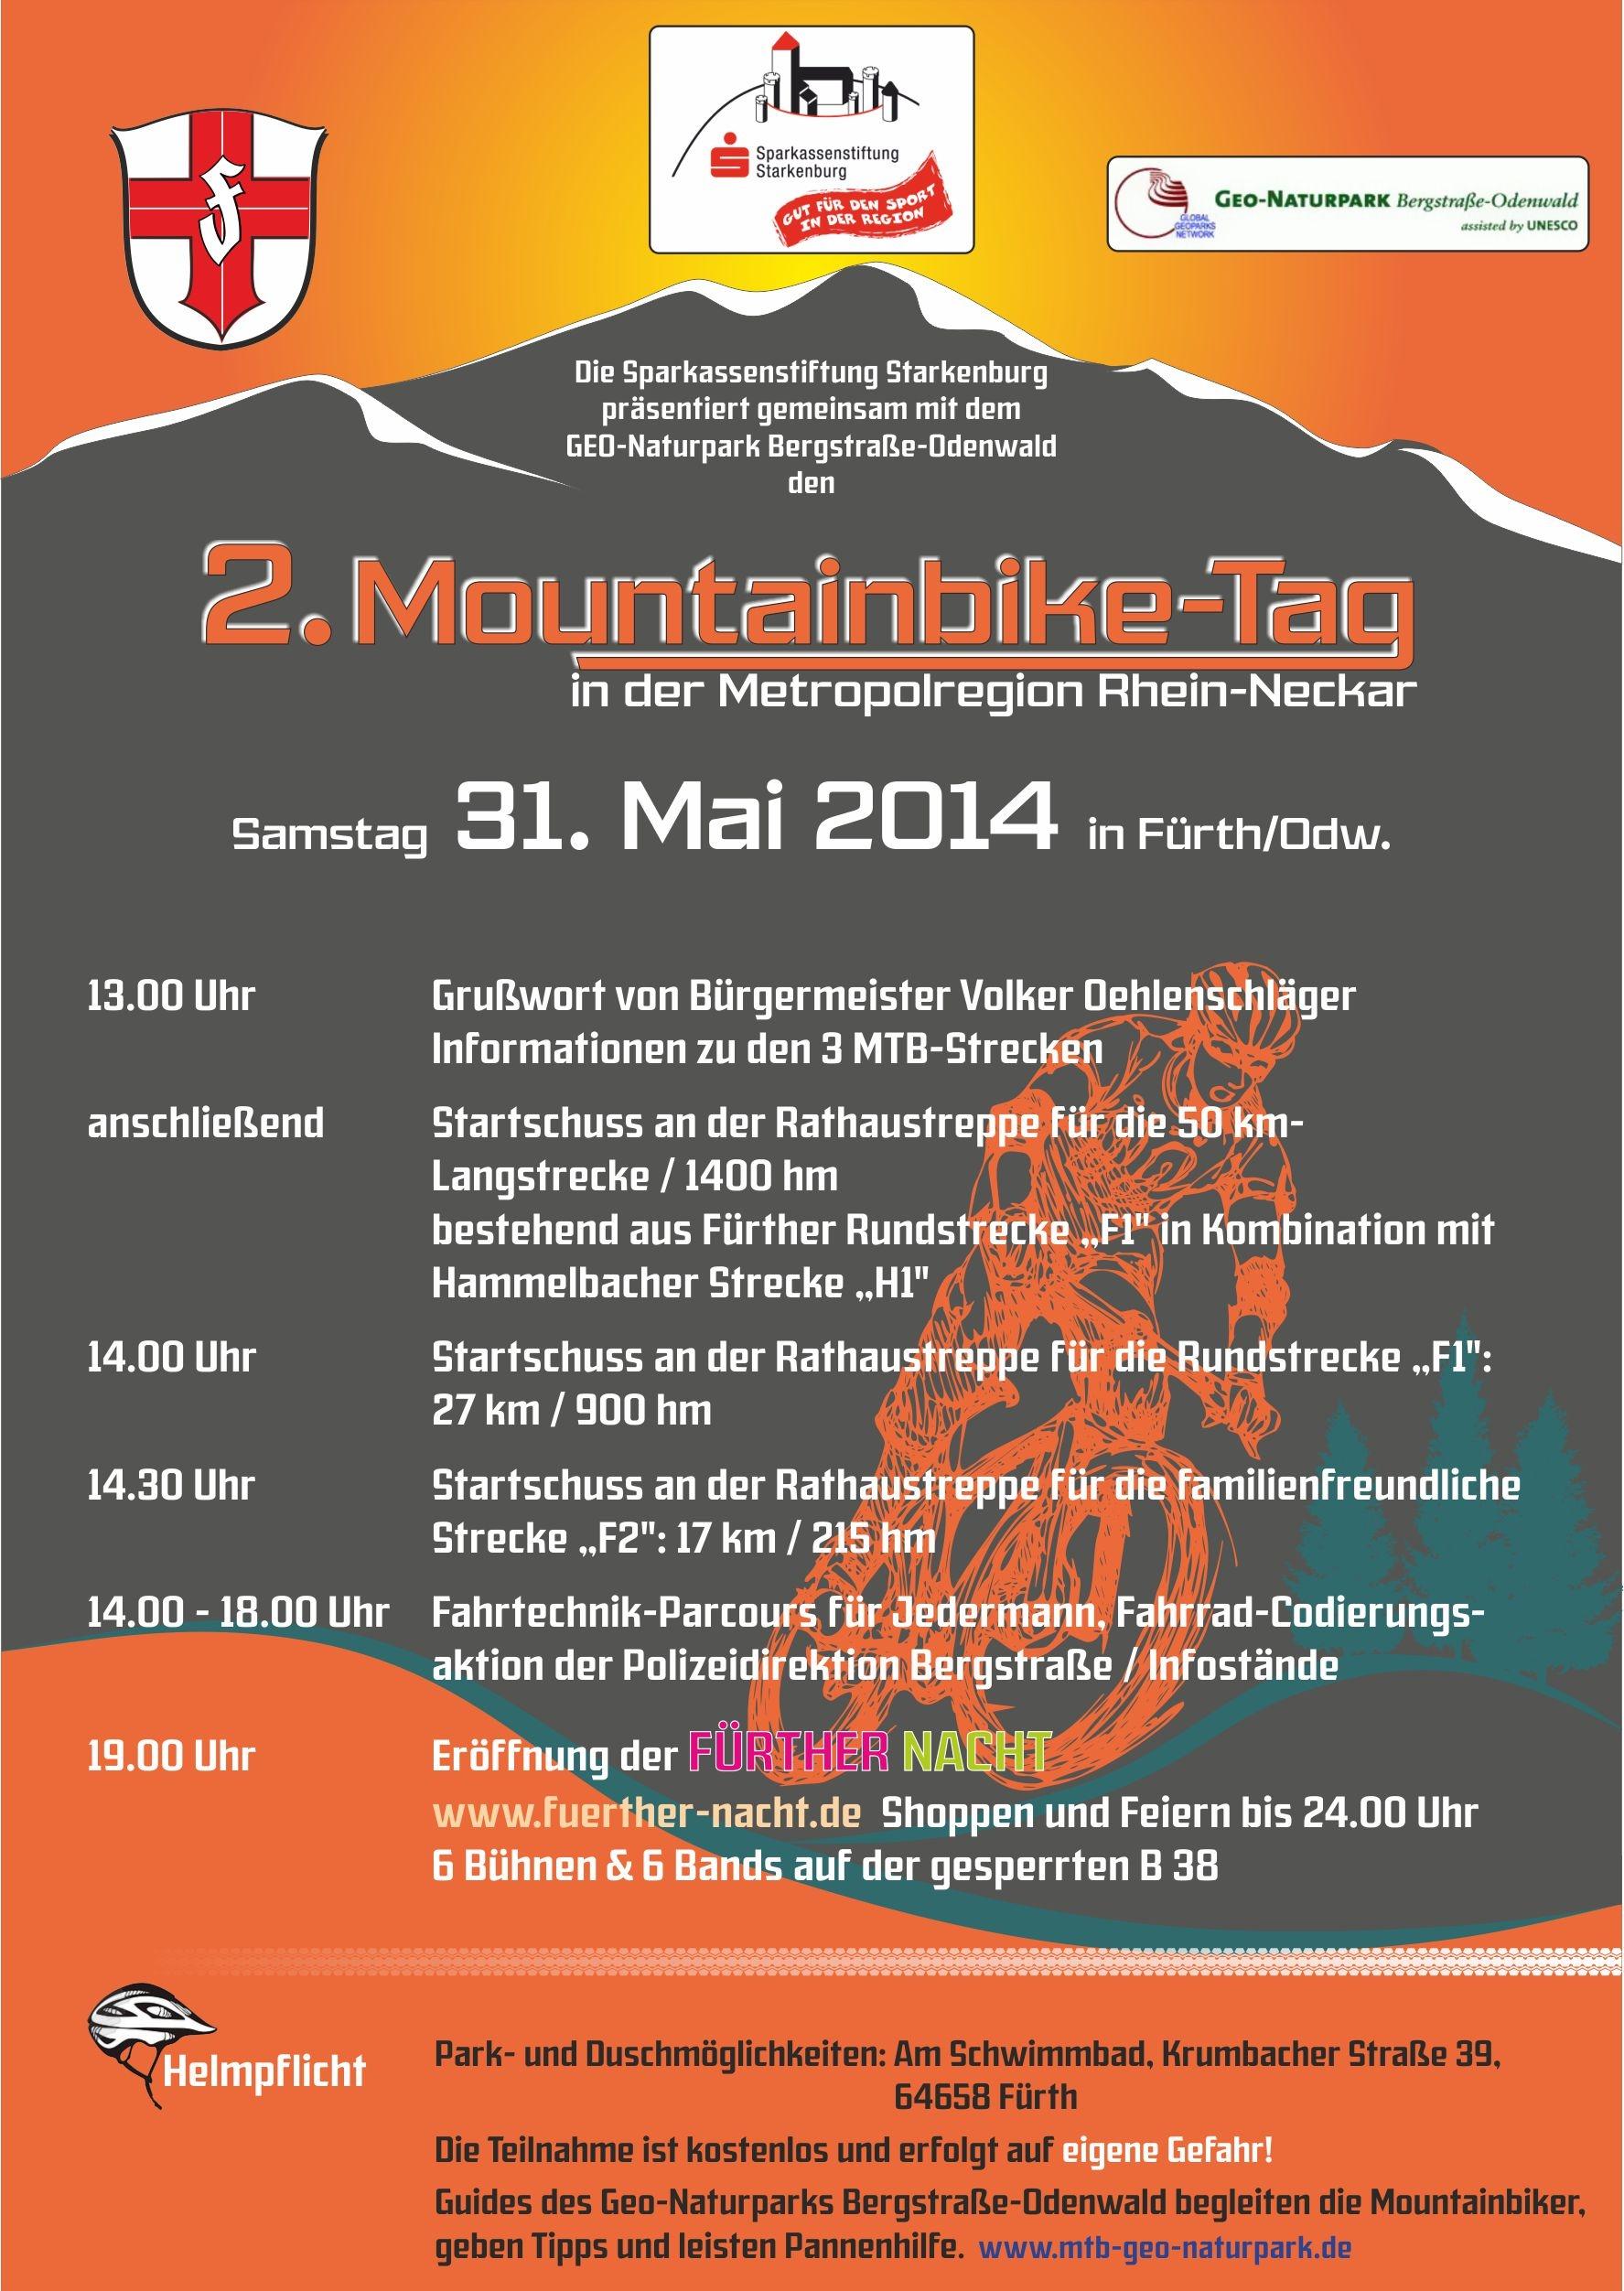 Flyer Mountainbike-Tag 2014